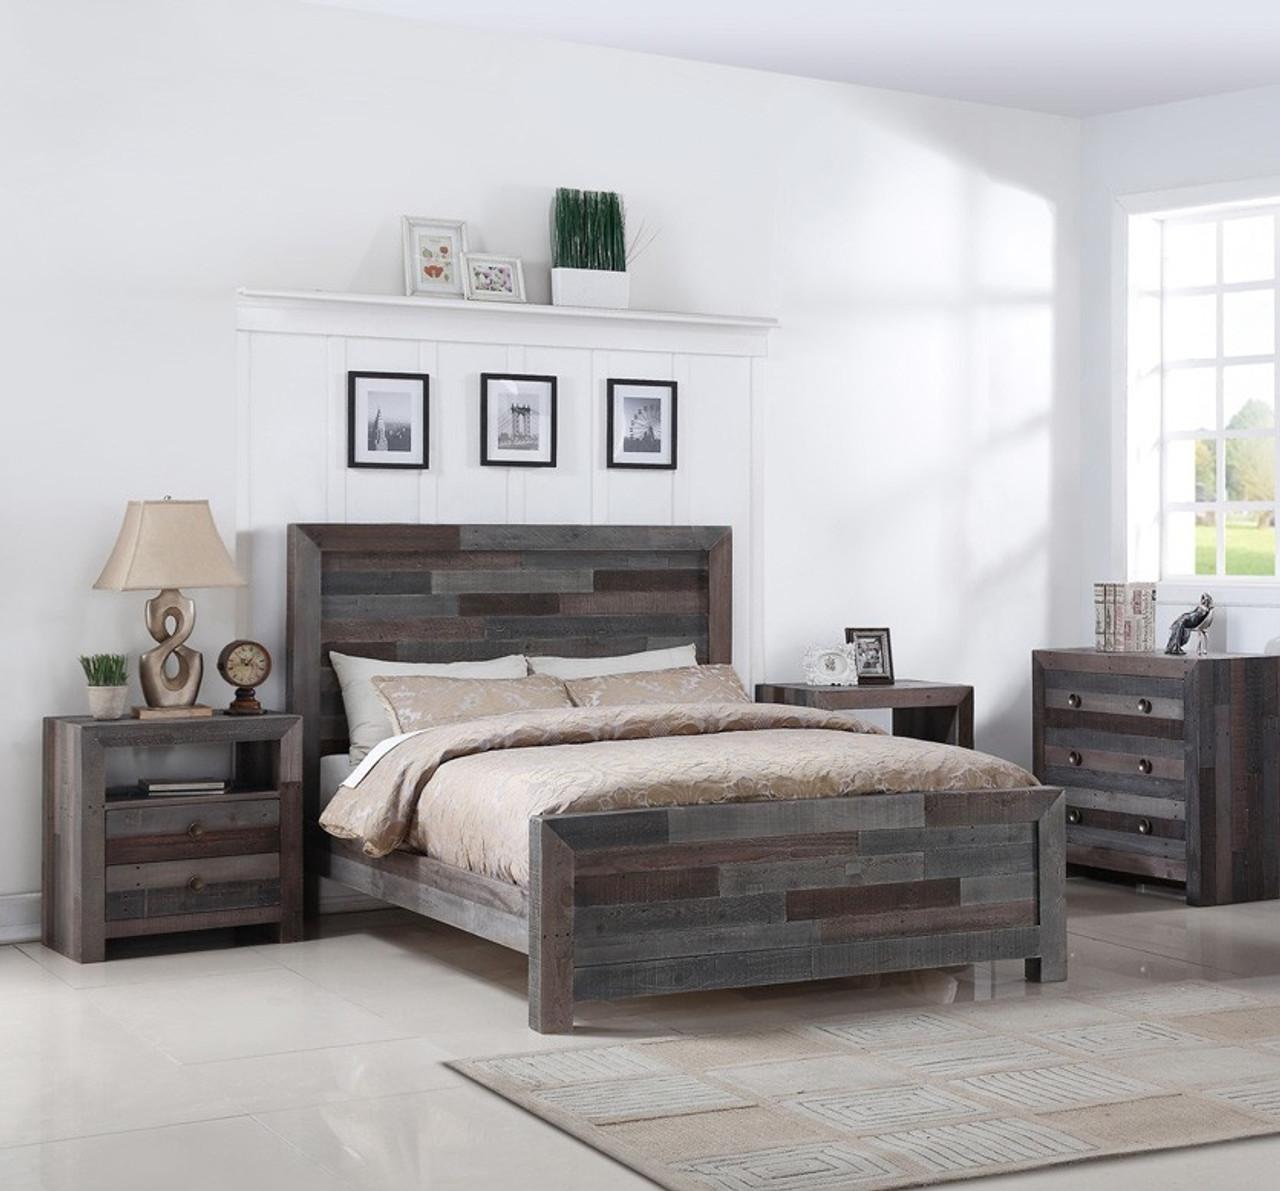 Angora Reclaimed Wood Queen Size Platform Bed - Storm ...